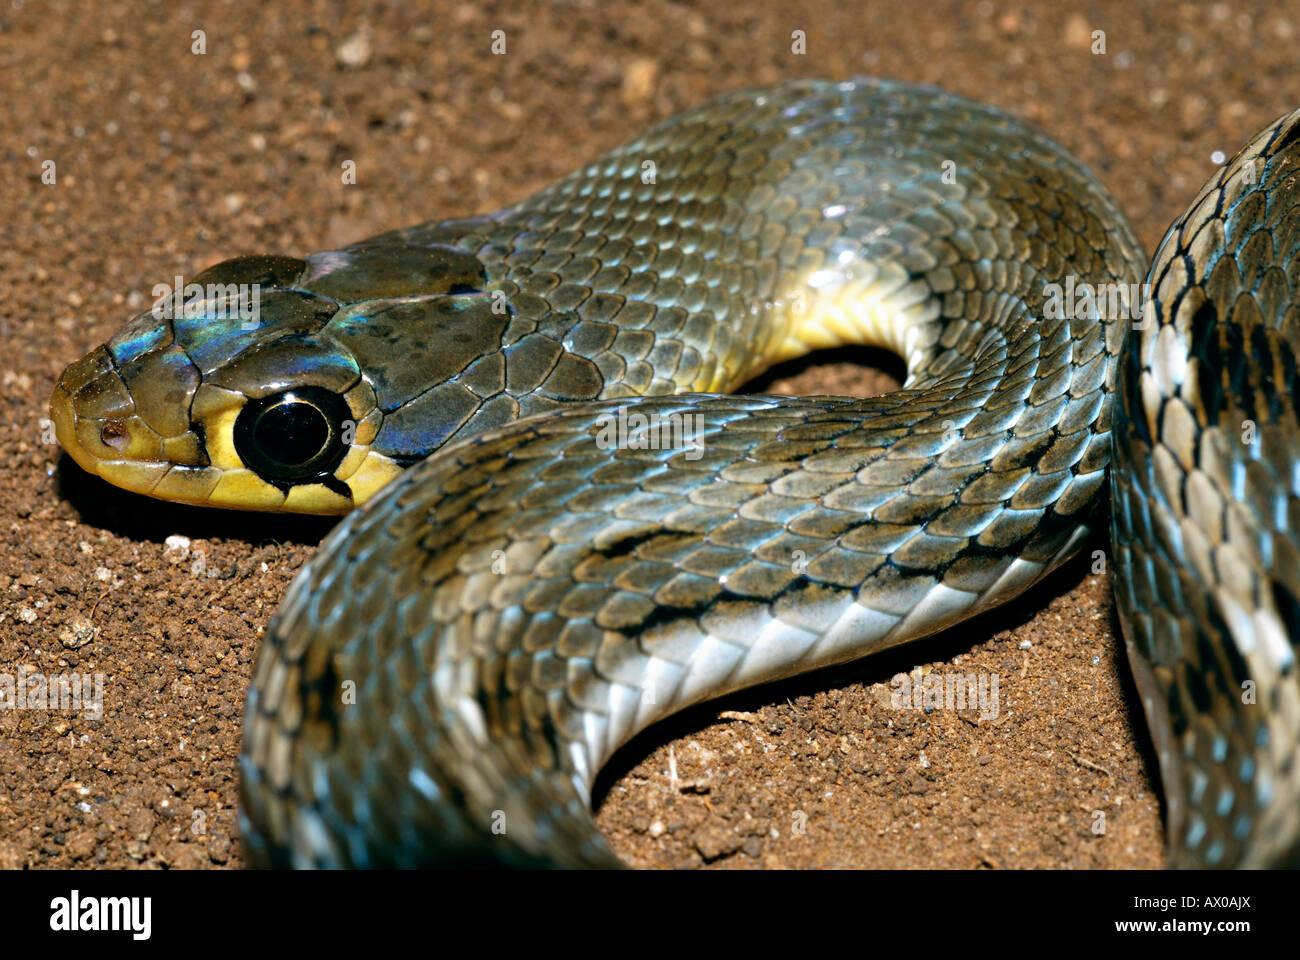 STRIPED KEELBACK Amphiesma stolatum Non-venomous, Common